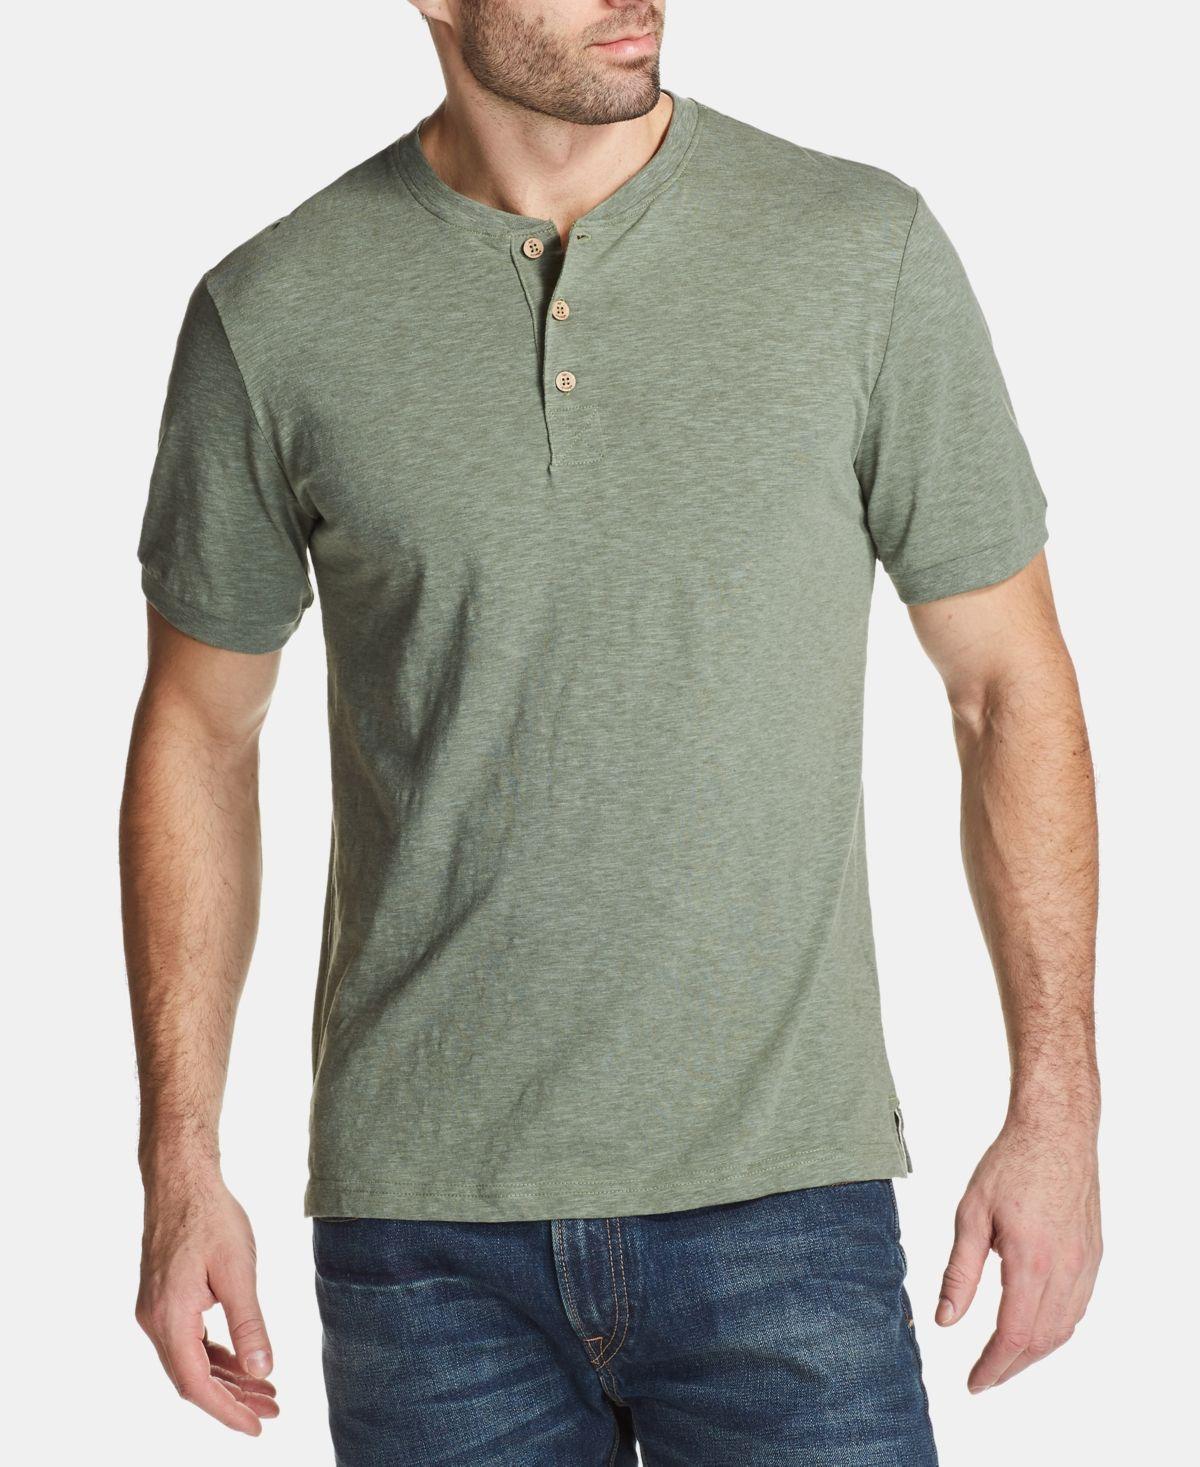 vintage henley t shirts